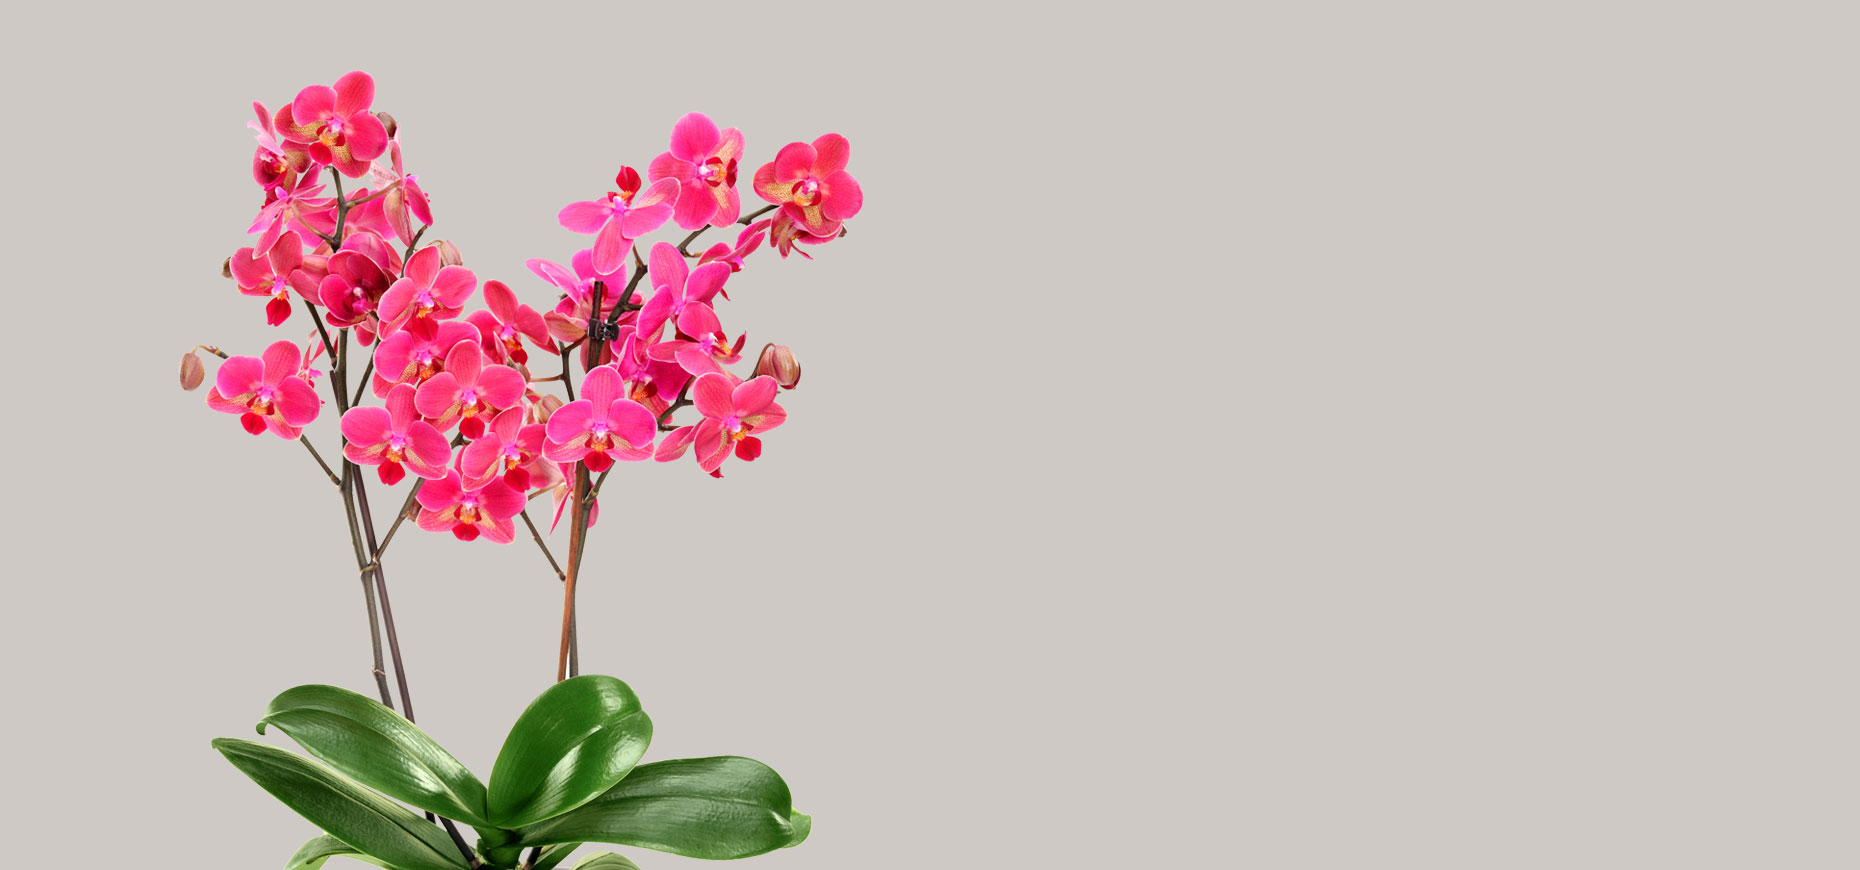 banner-principal-orquideas